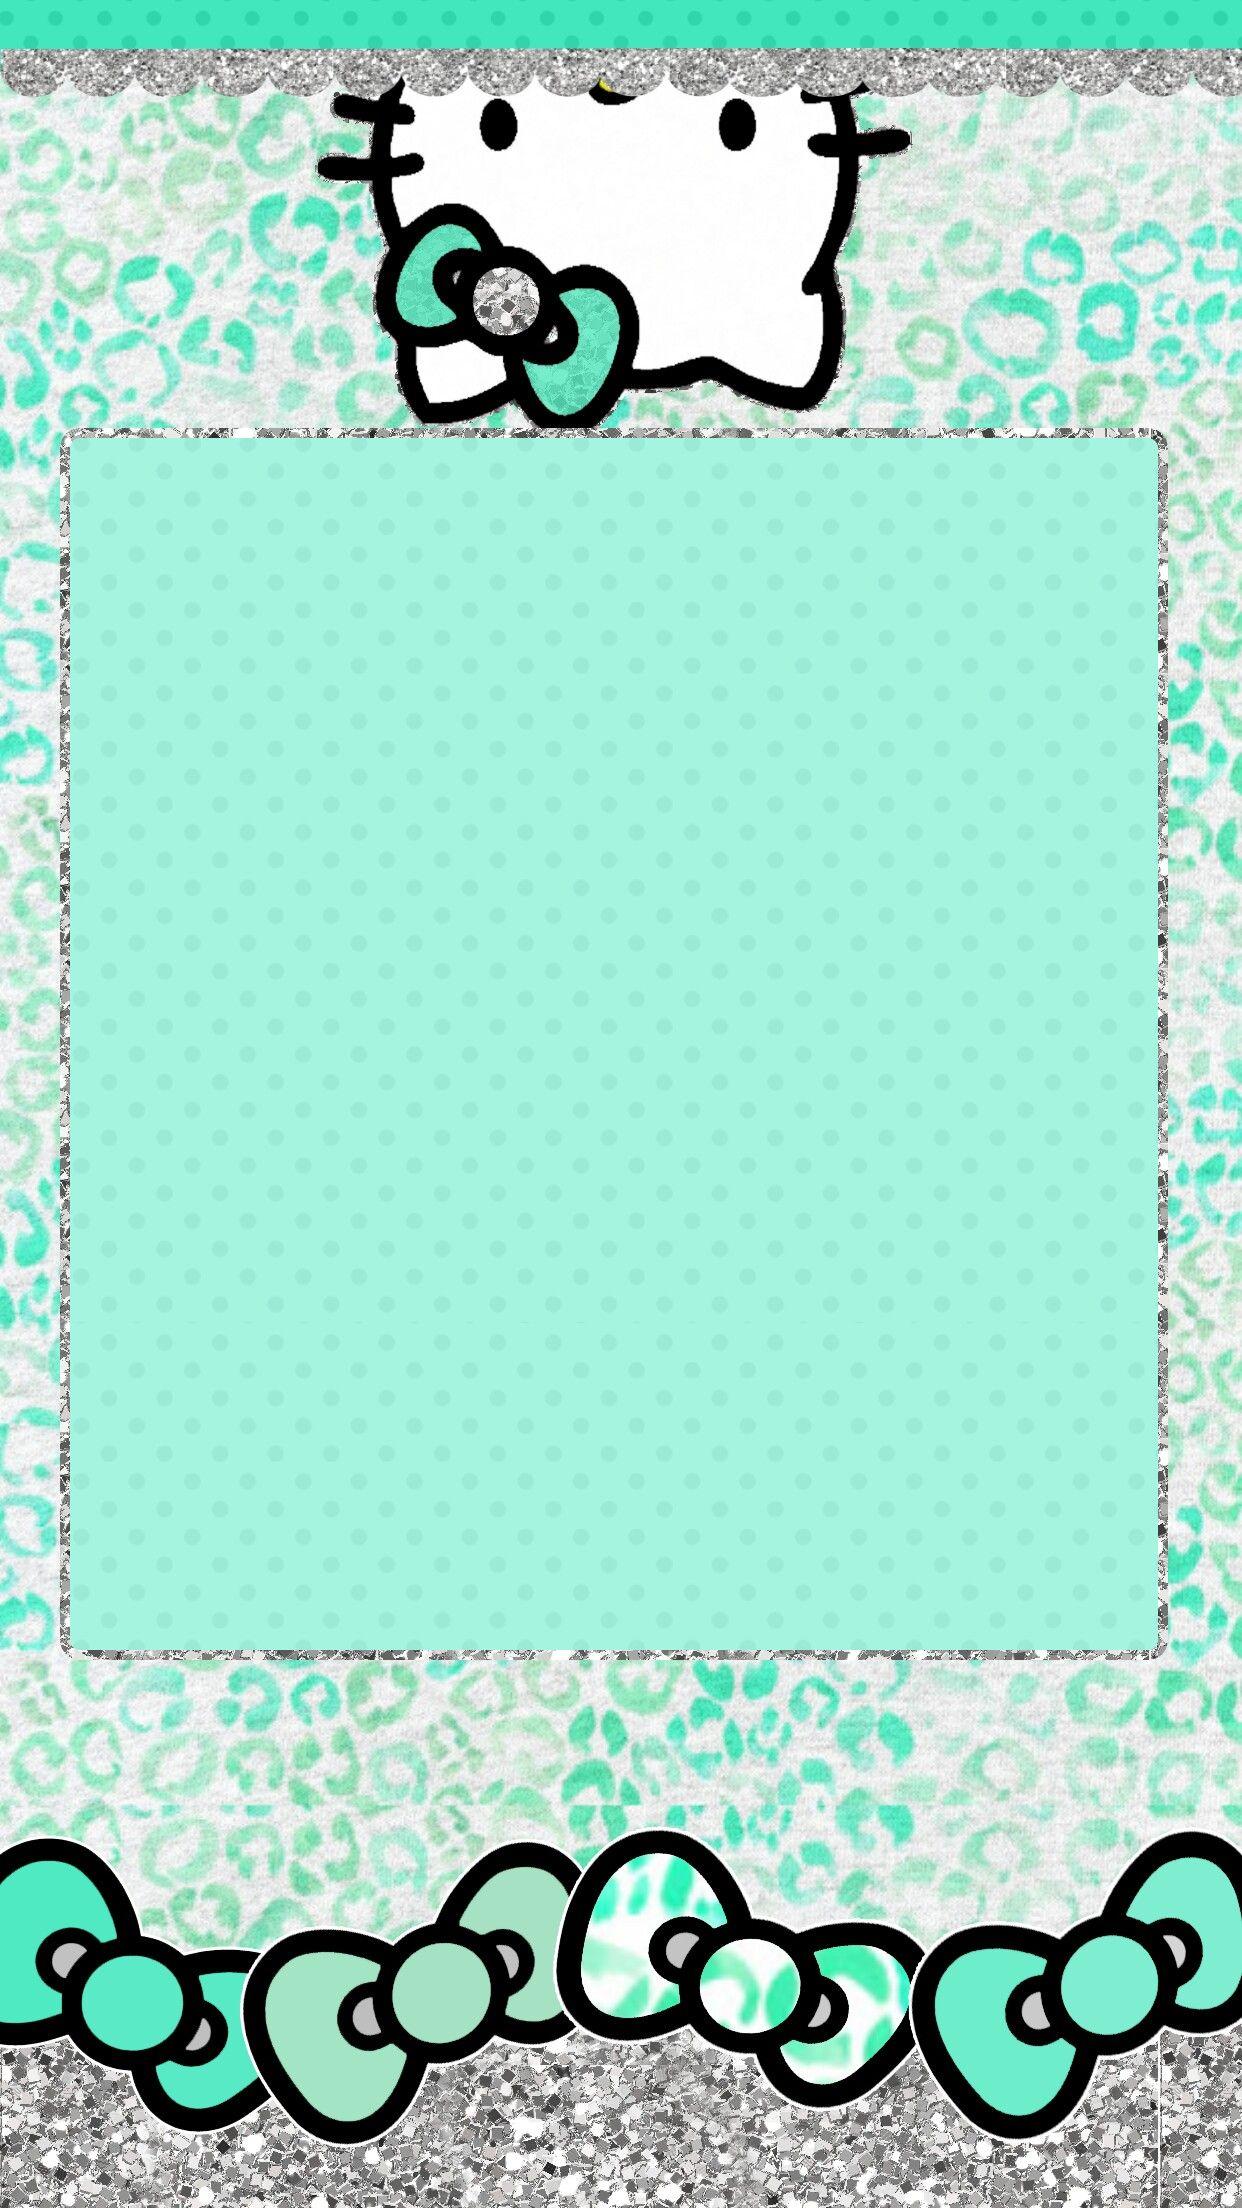 Good Wallpaper Hello Kitty Turquoise - 50588a2a4494286550e675dc517a2e13  Gallery_92669.jpg